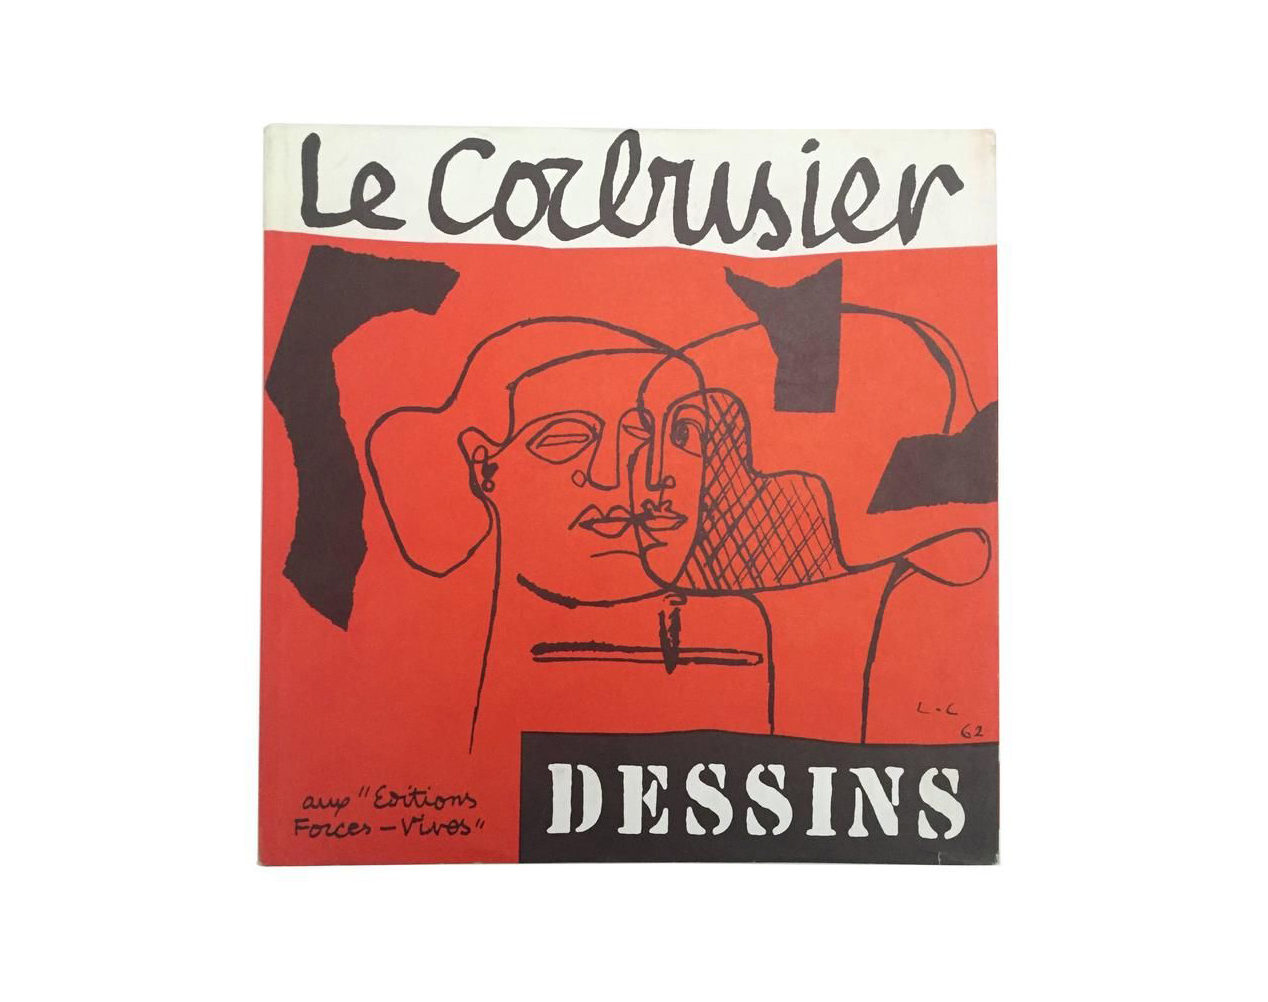 The Spaces Xmas gift guide - Le Corbusier's Suite de Dessins first edition